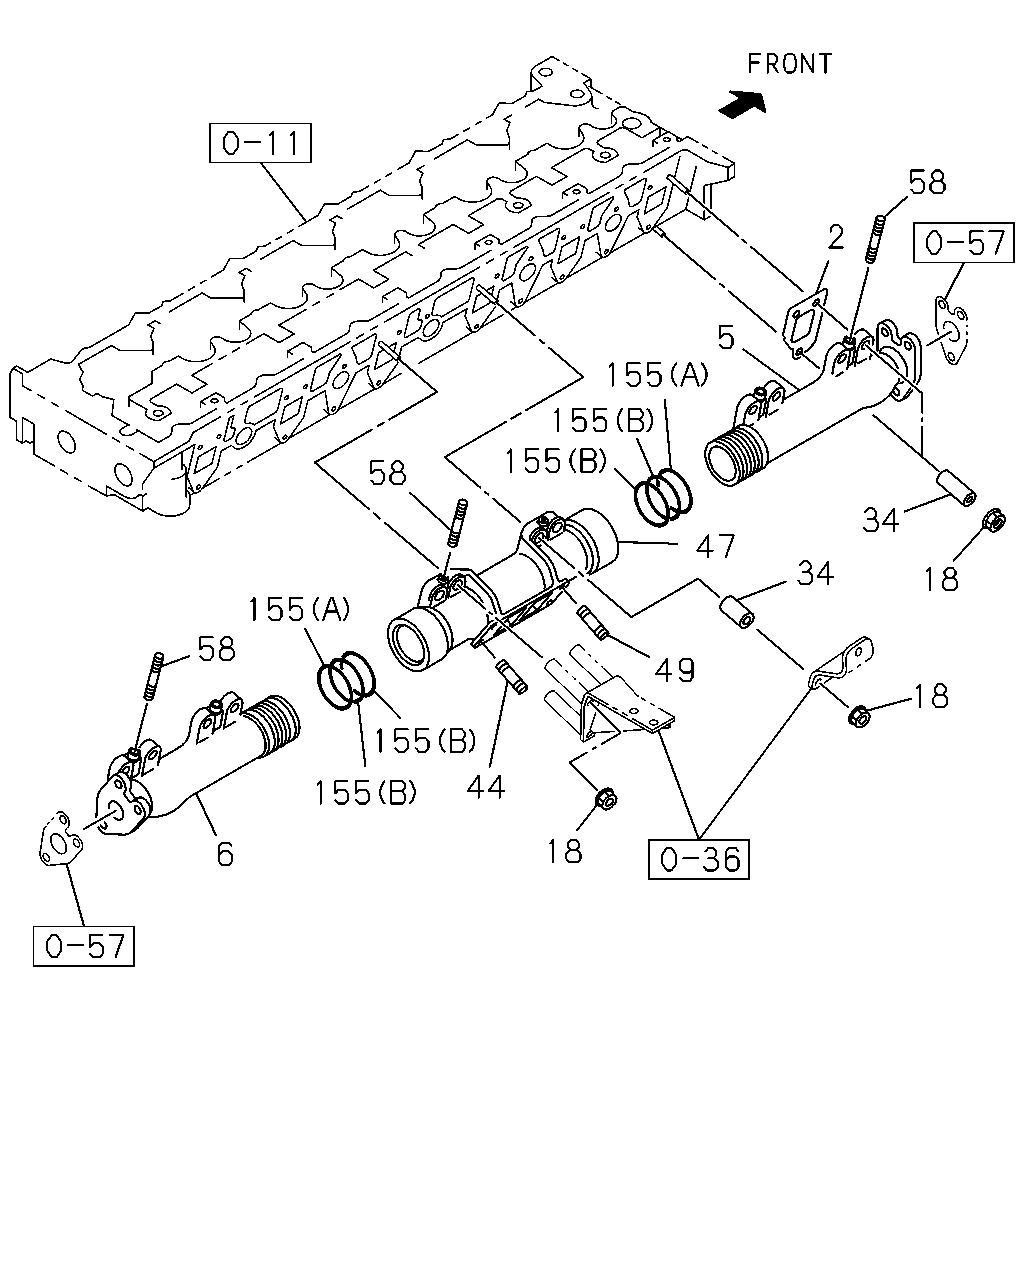 58l Exhaust Manifold Diagram - Wiring Diagrams Dash on